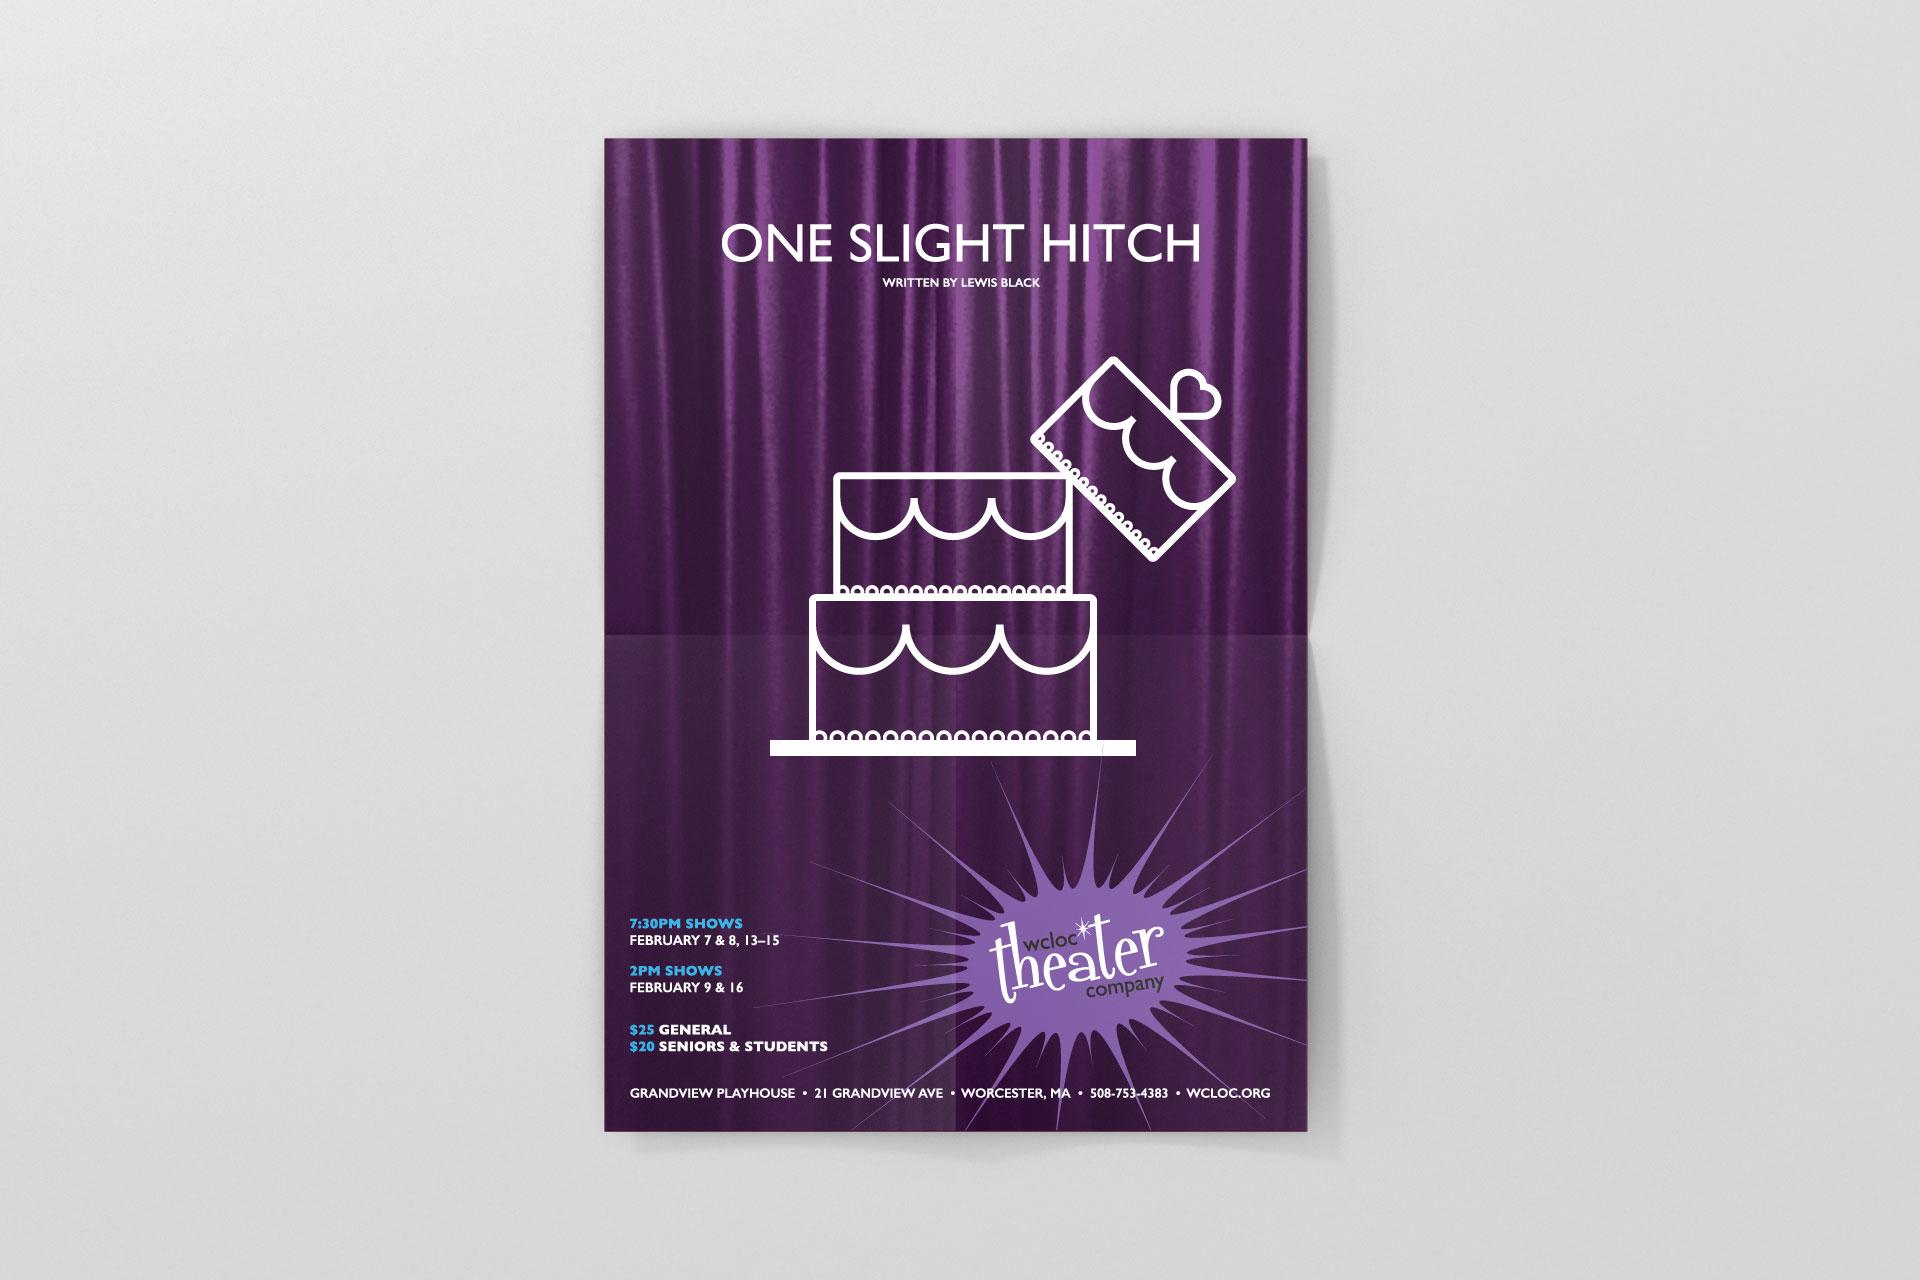 WCLOC Theaterh Poster - One Slight Hitch